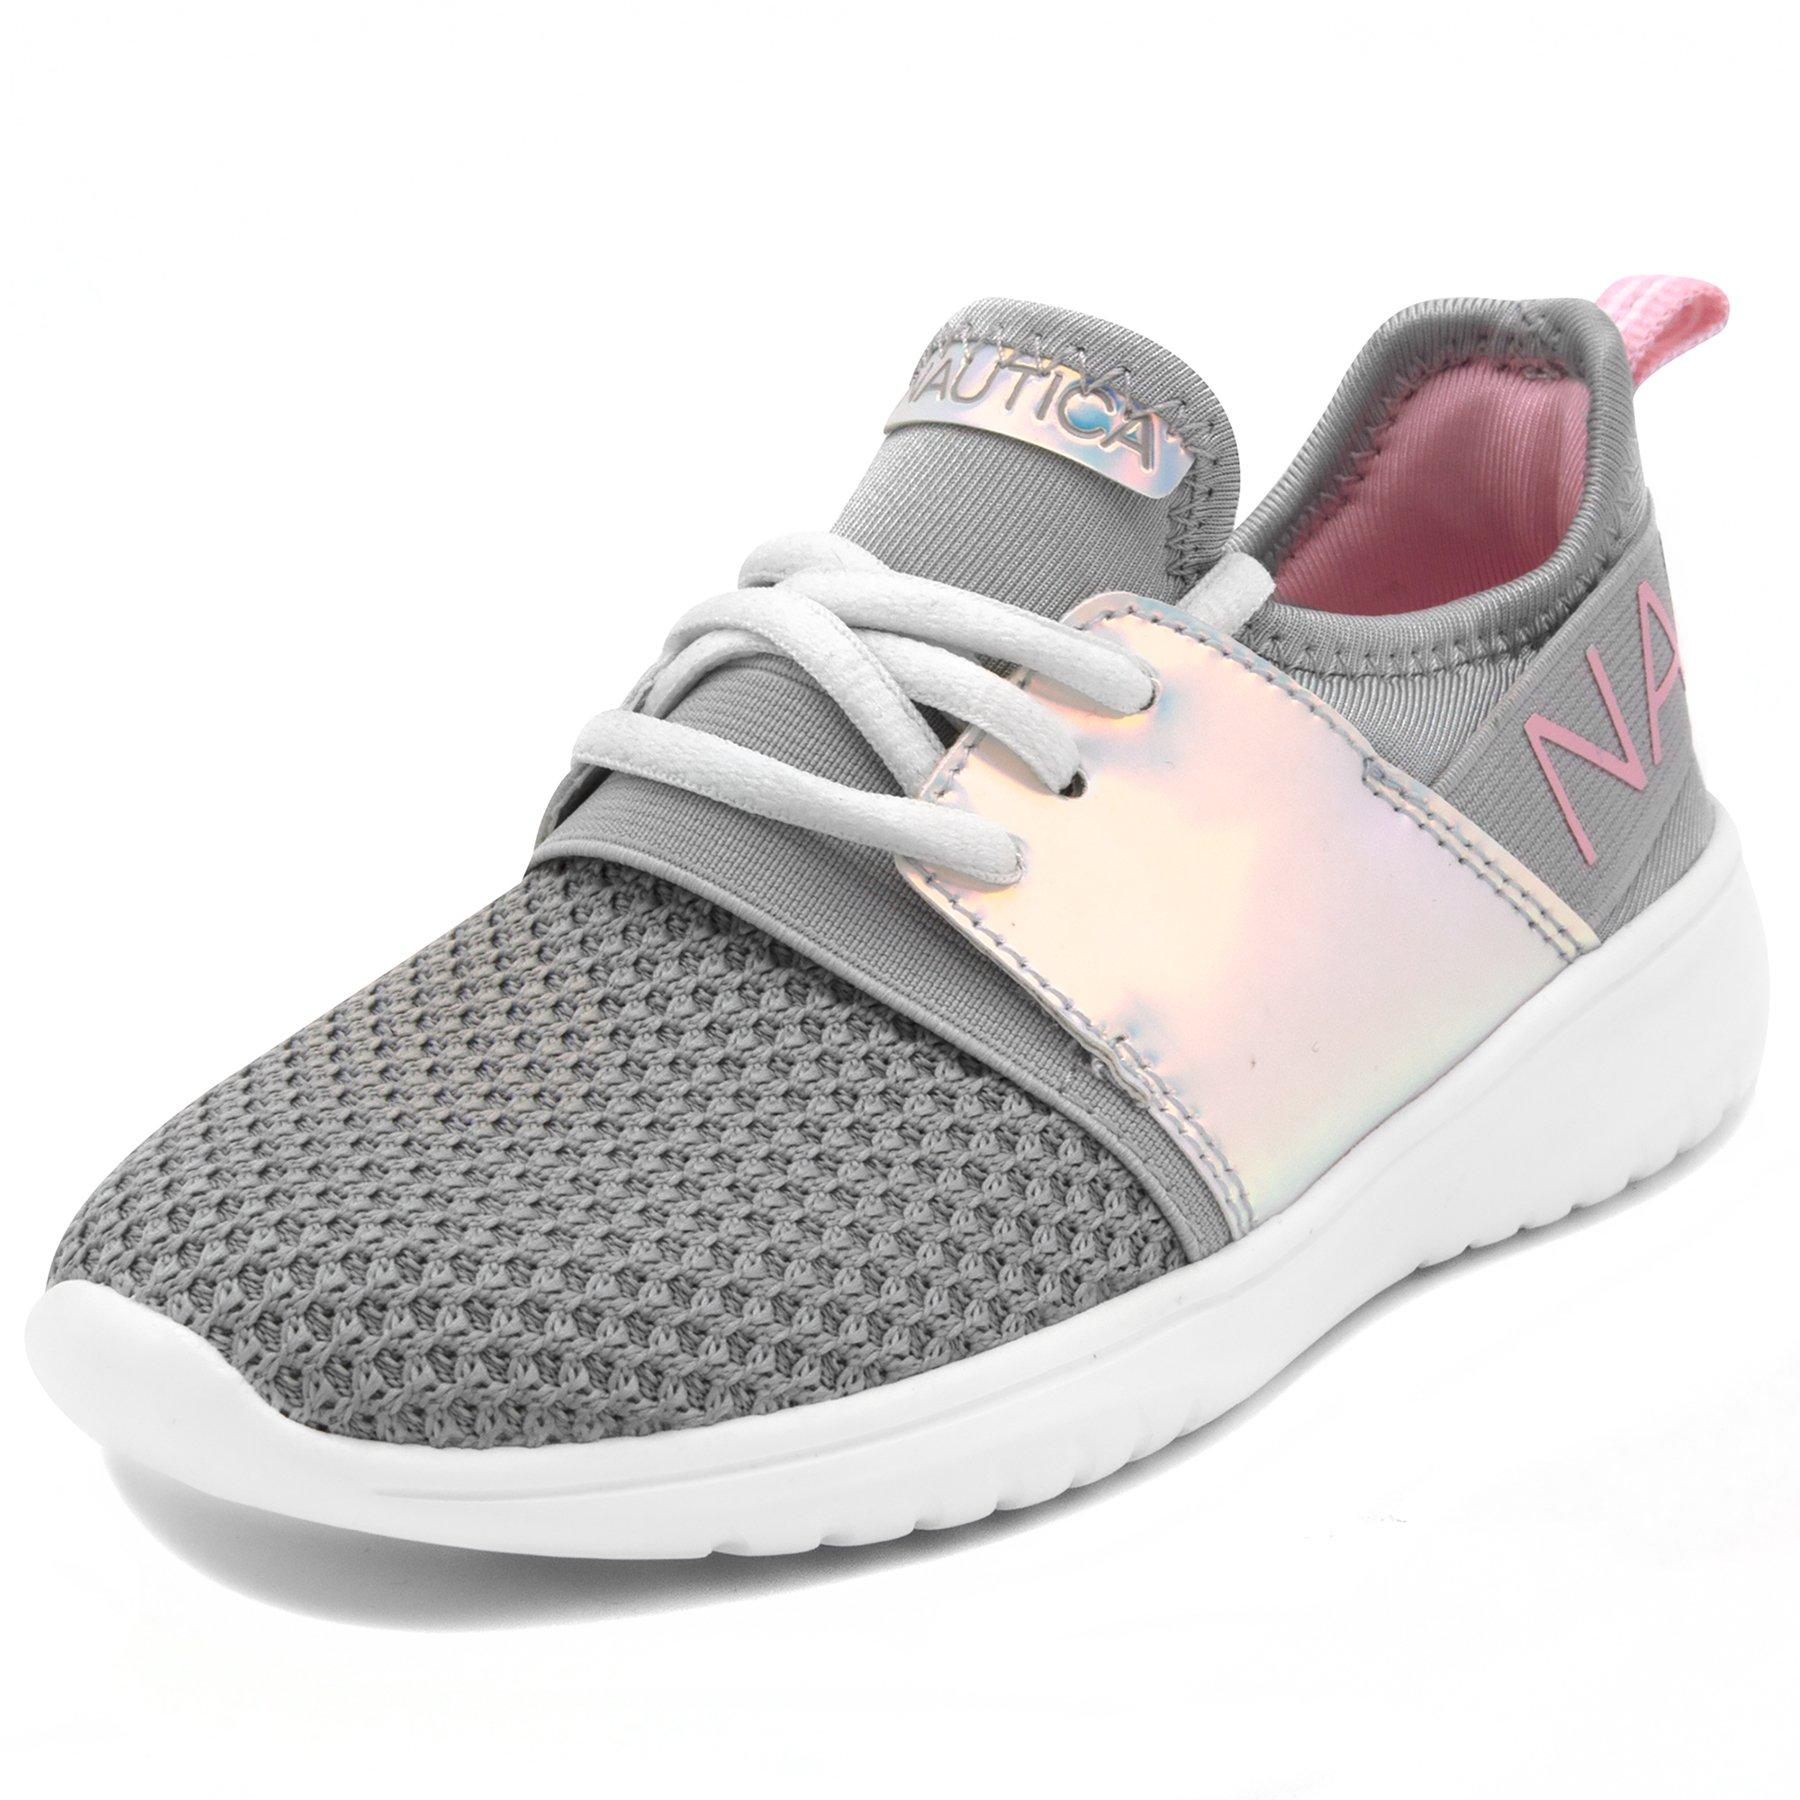 Nautica Kids Girls Fashion Sneaker Running Shoes-Kappil Girls-Silver-3